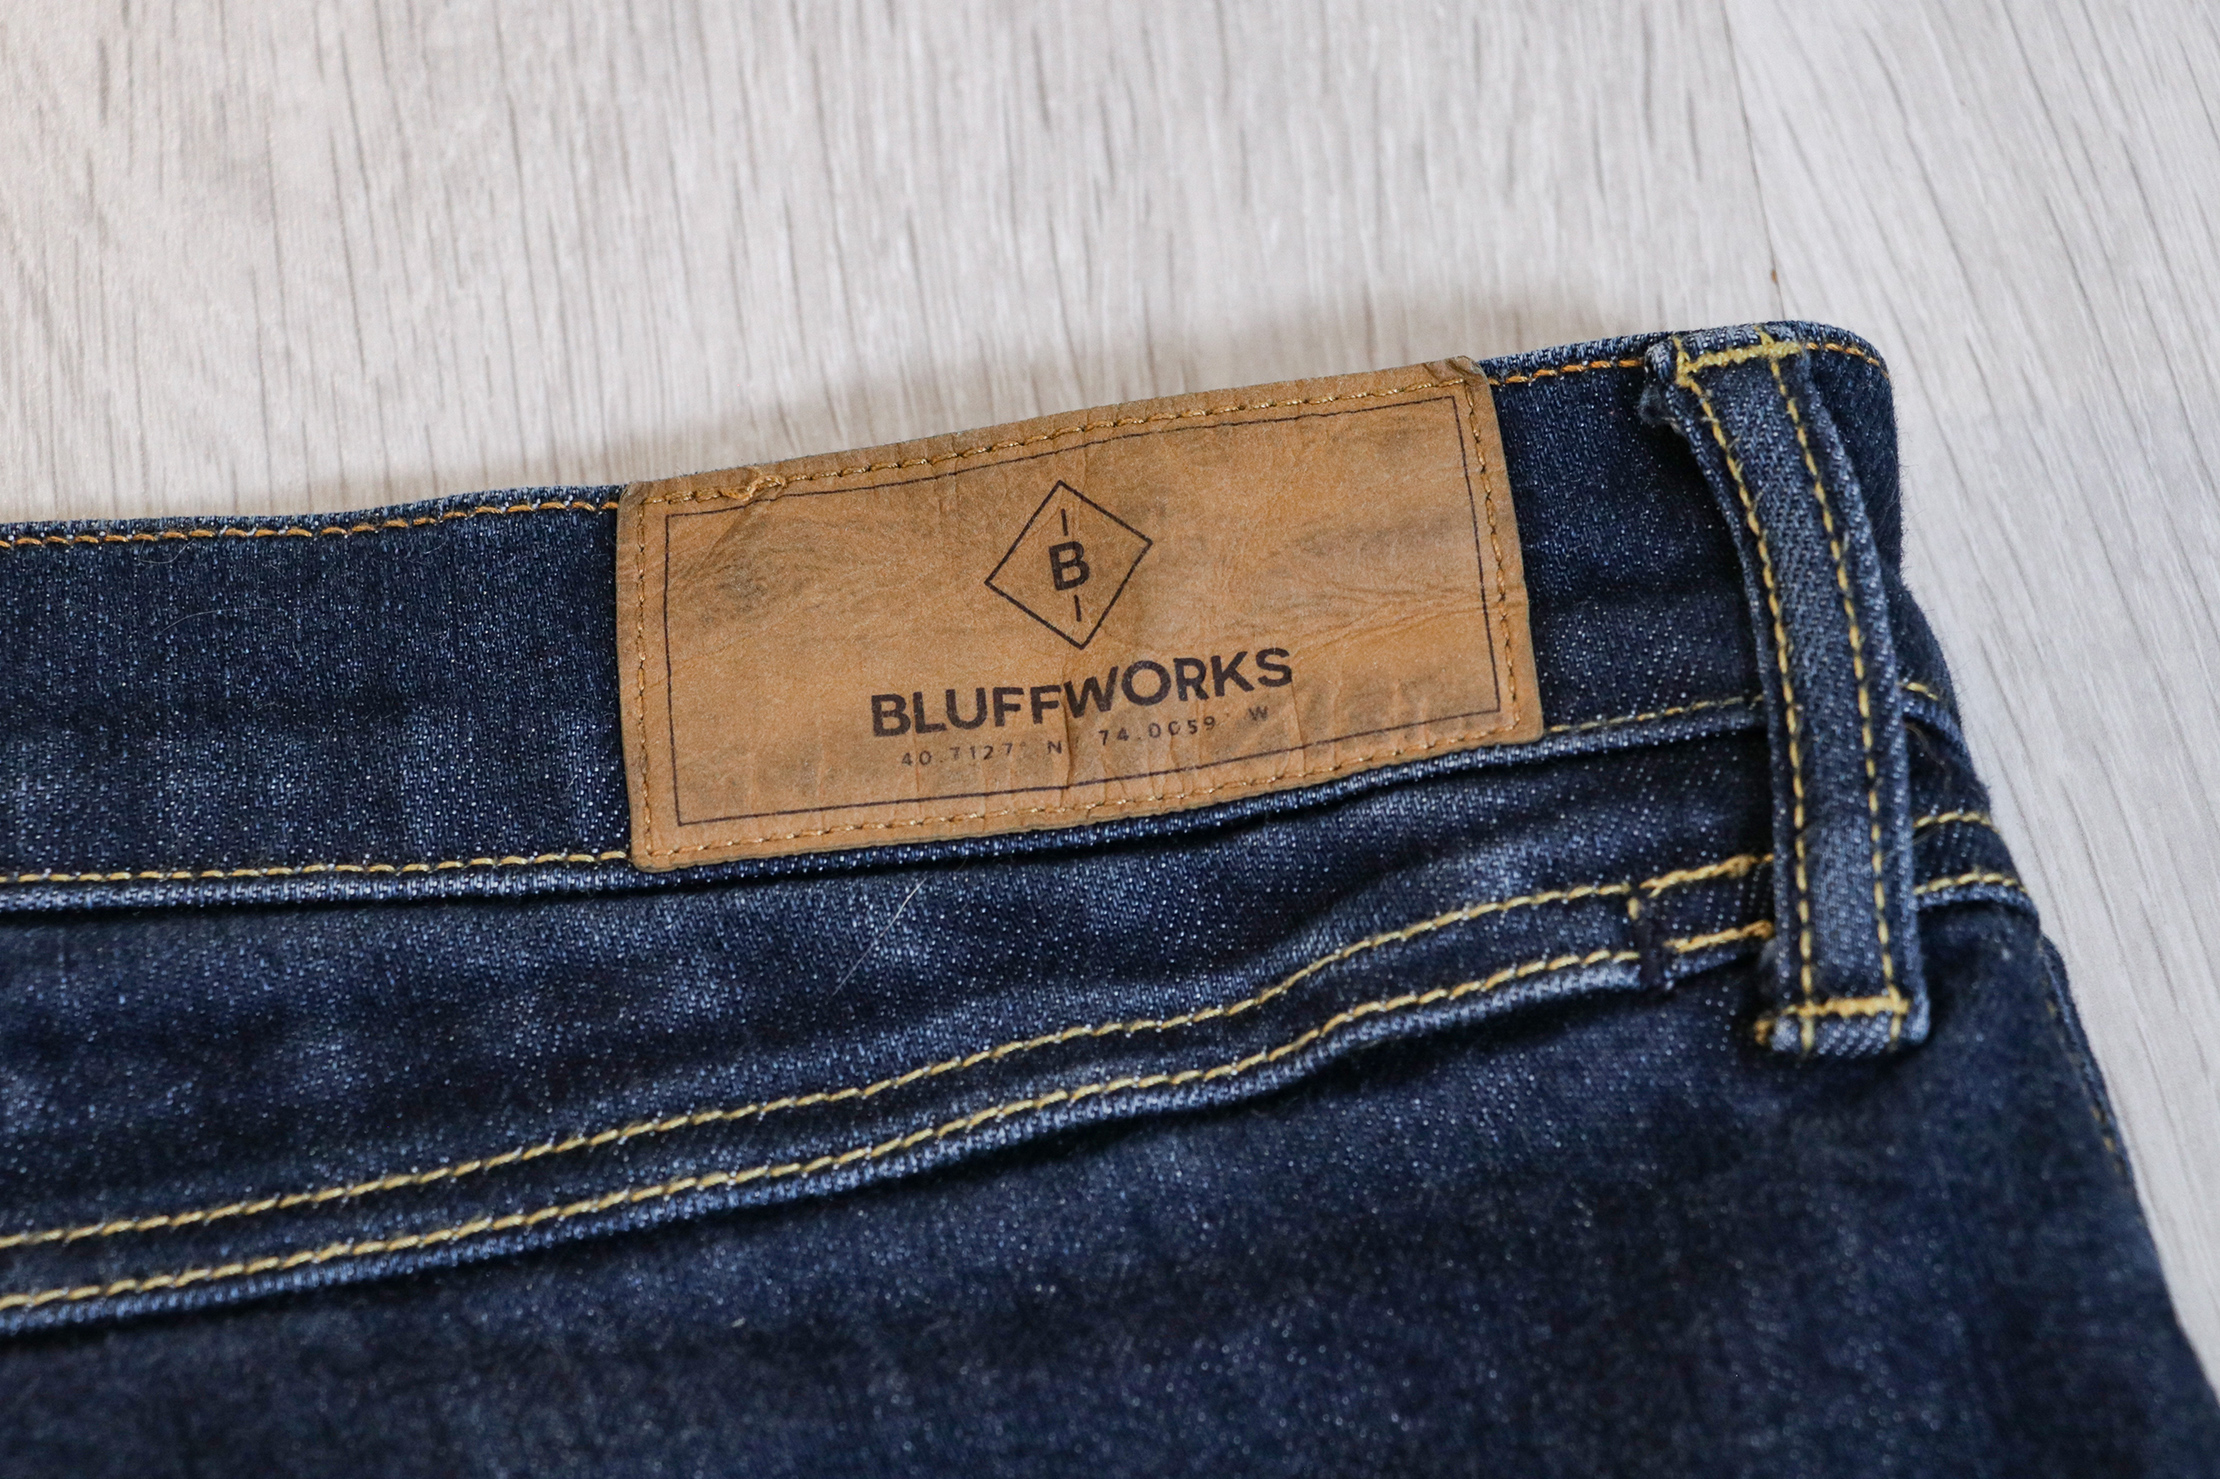 Bluffworks Departure Travel Jeans Branding